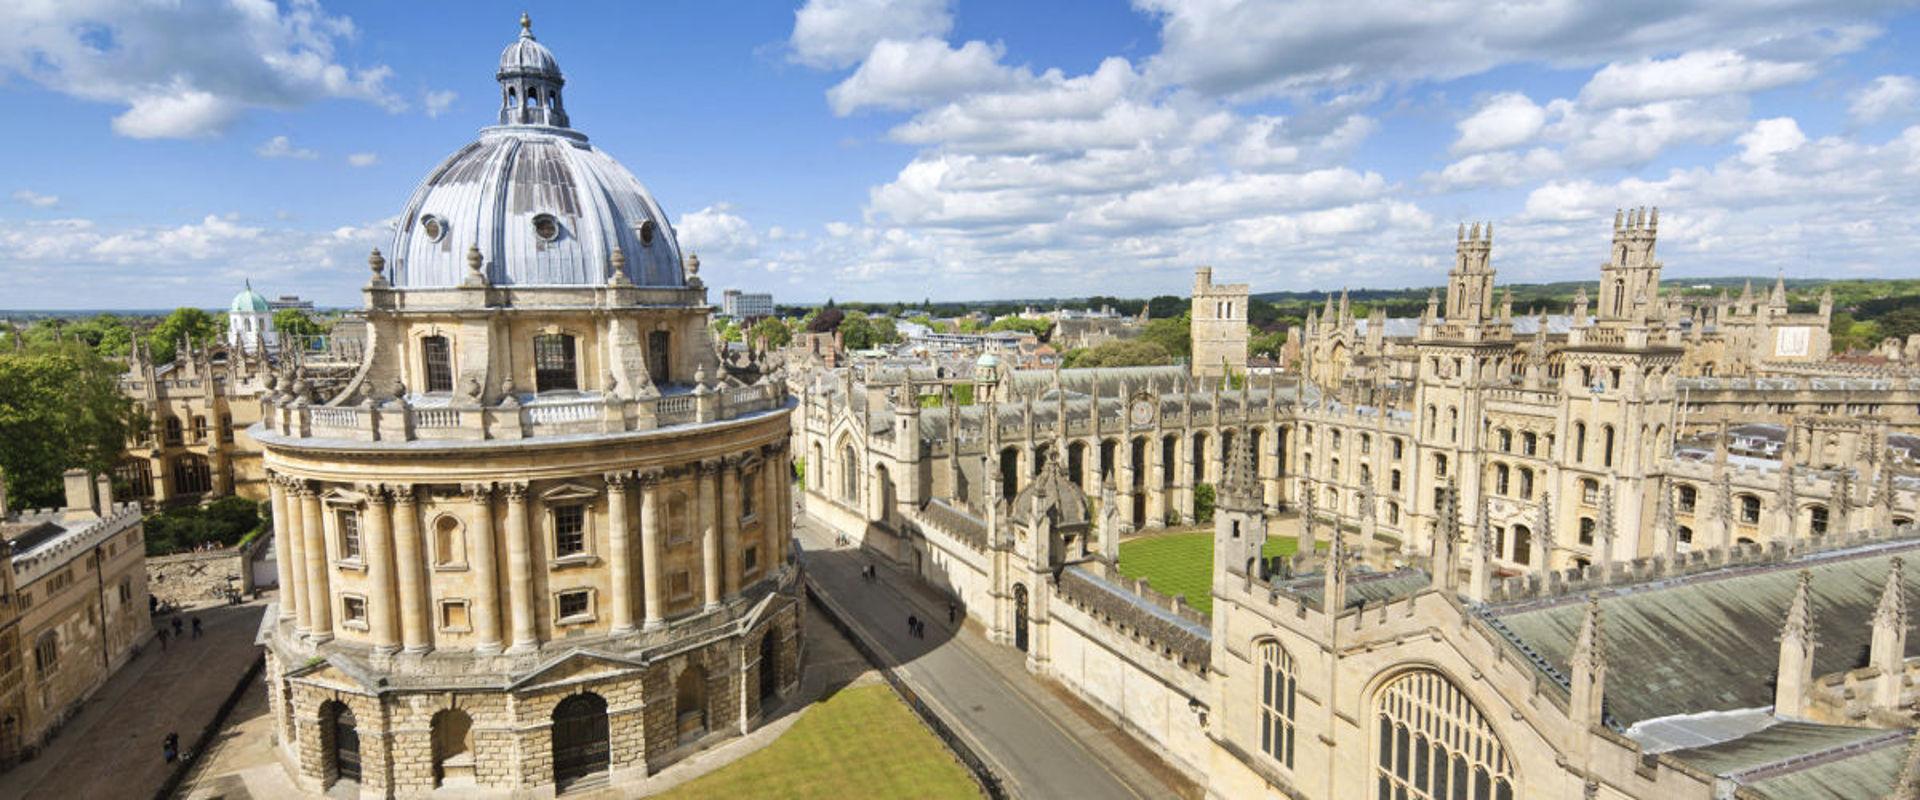 Oxford University Oxford Hotels